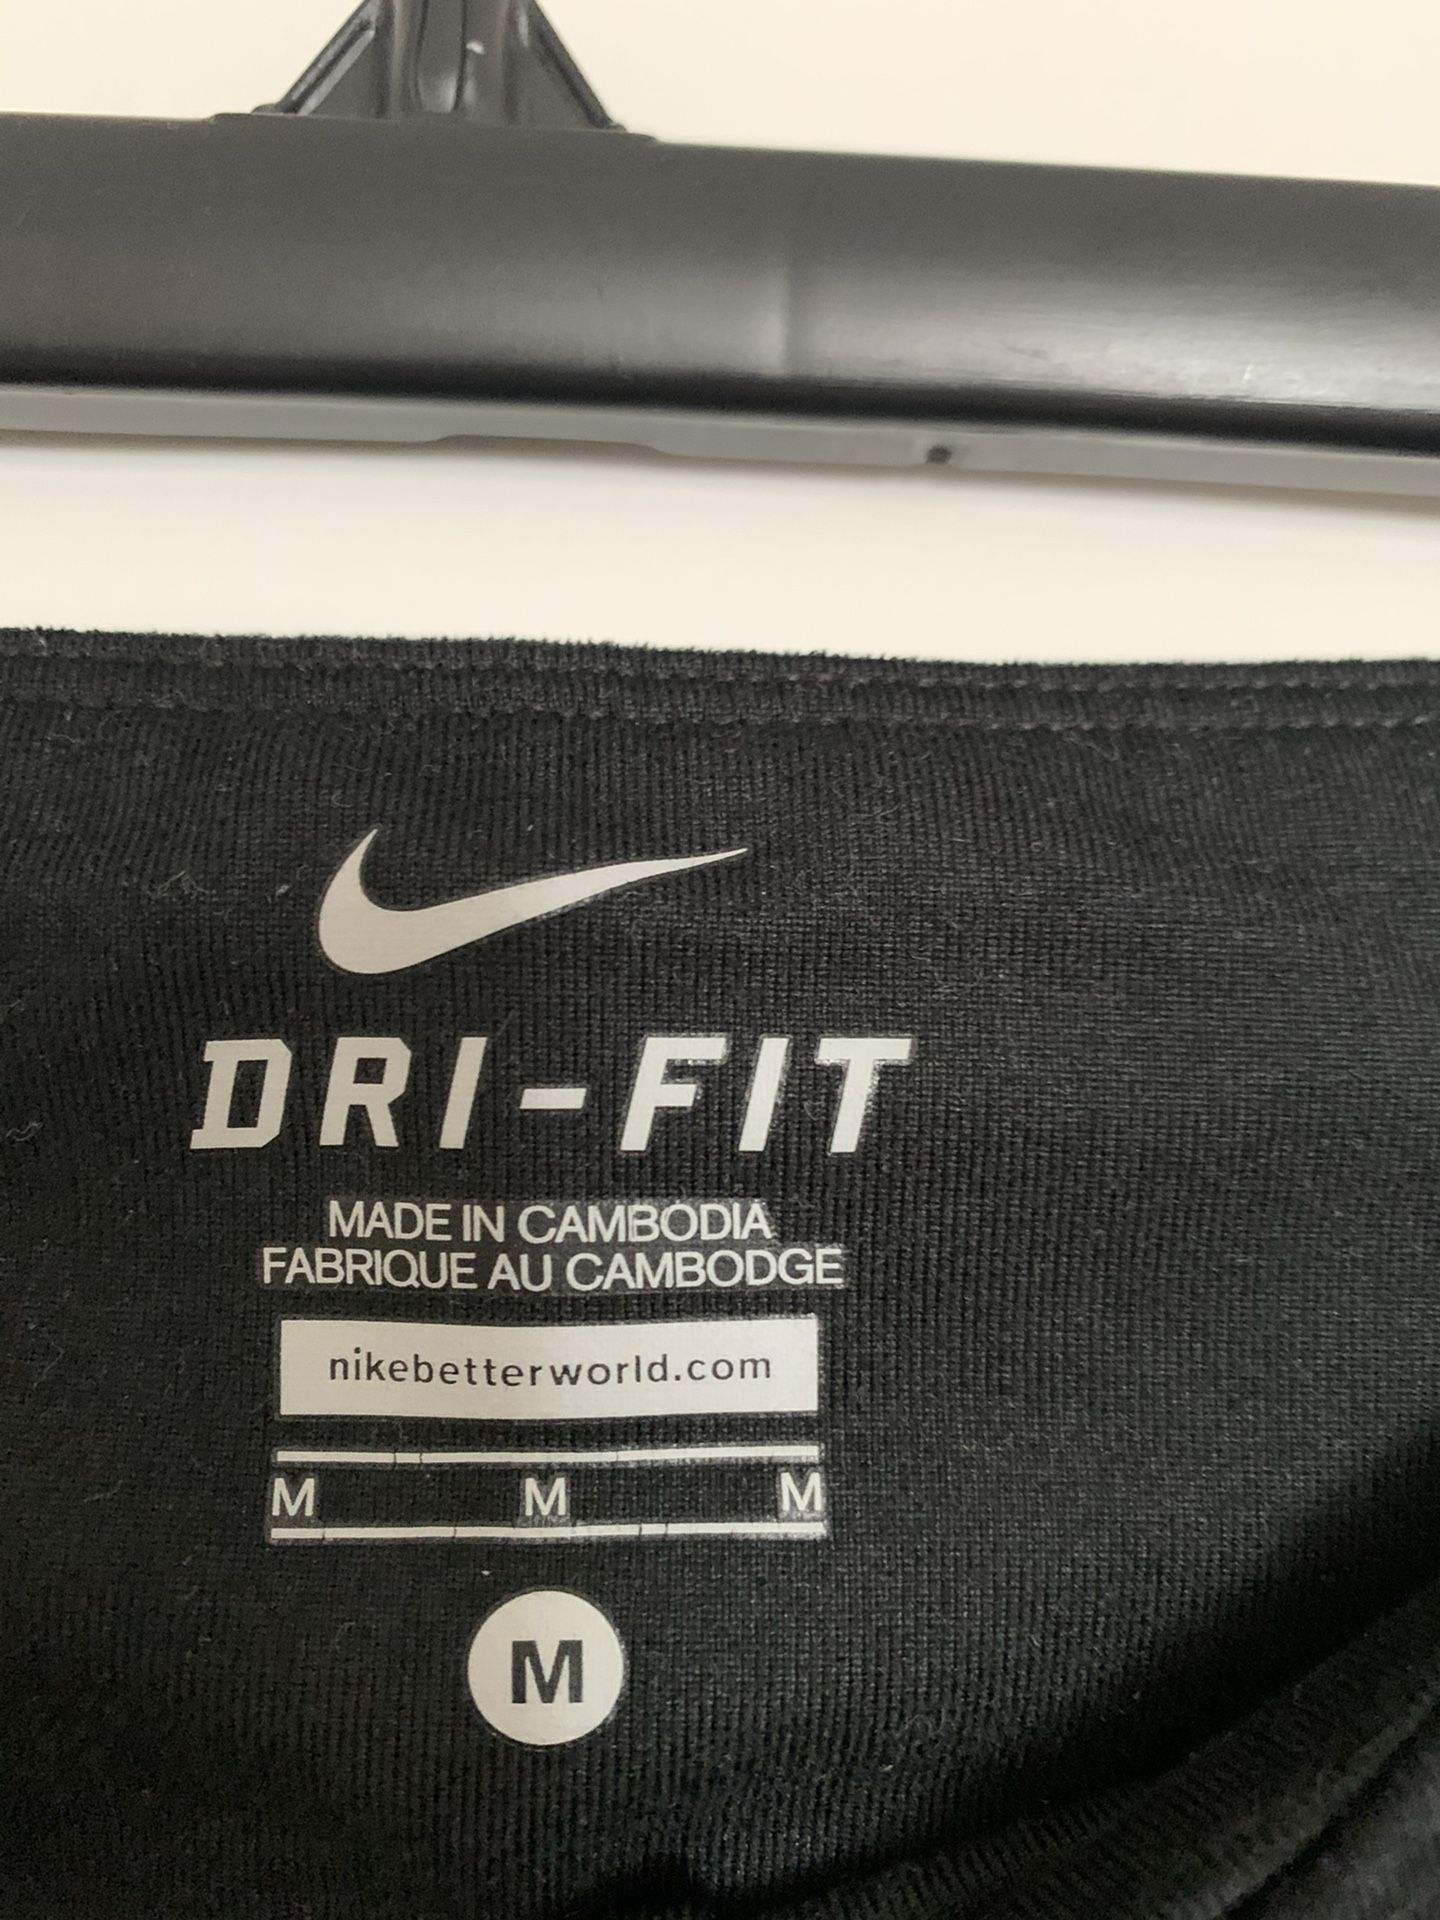 Nike Woman Leggings , Black Color, Size m